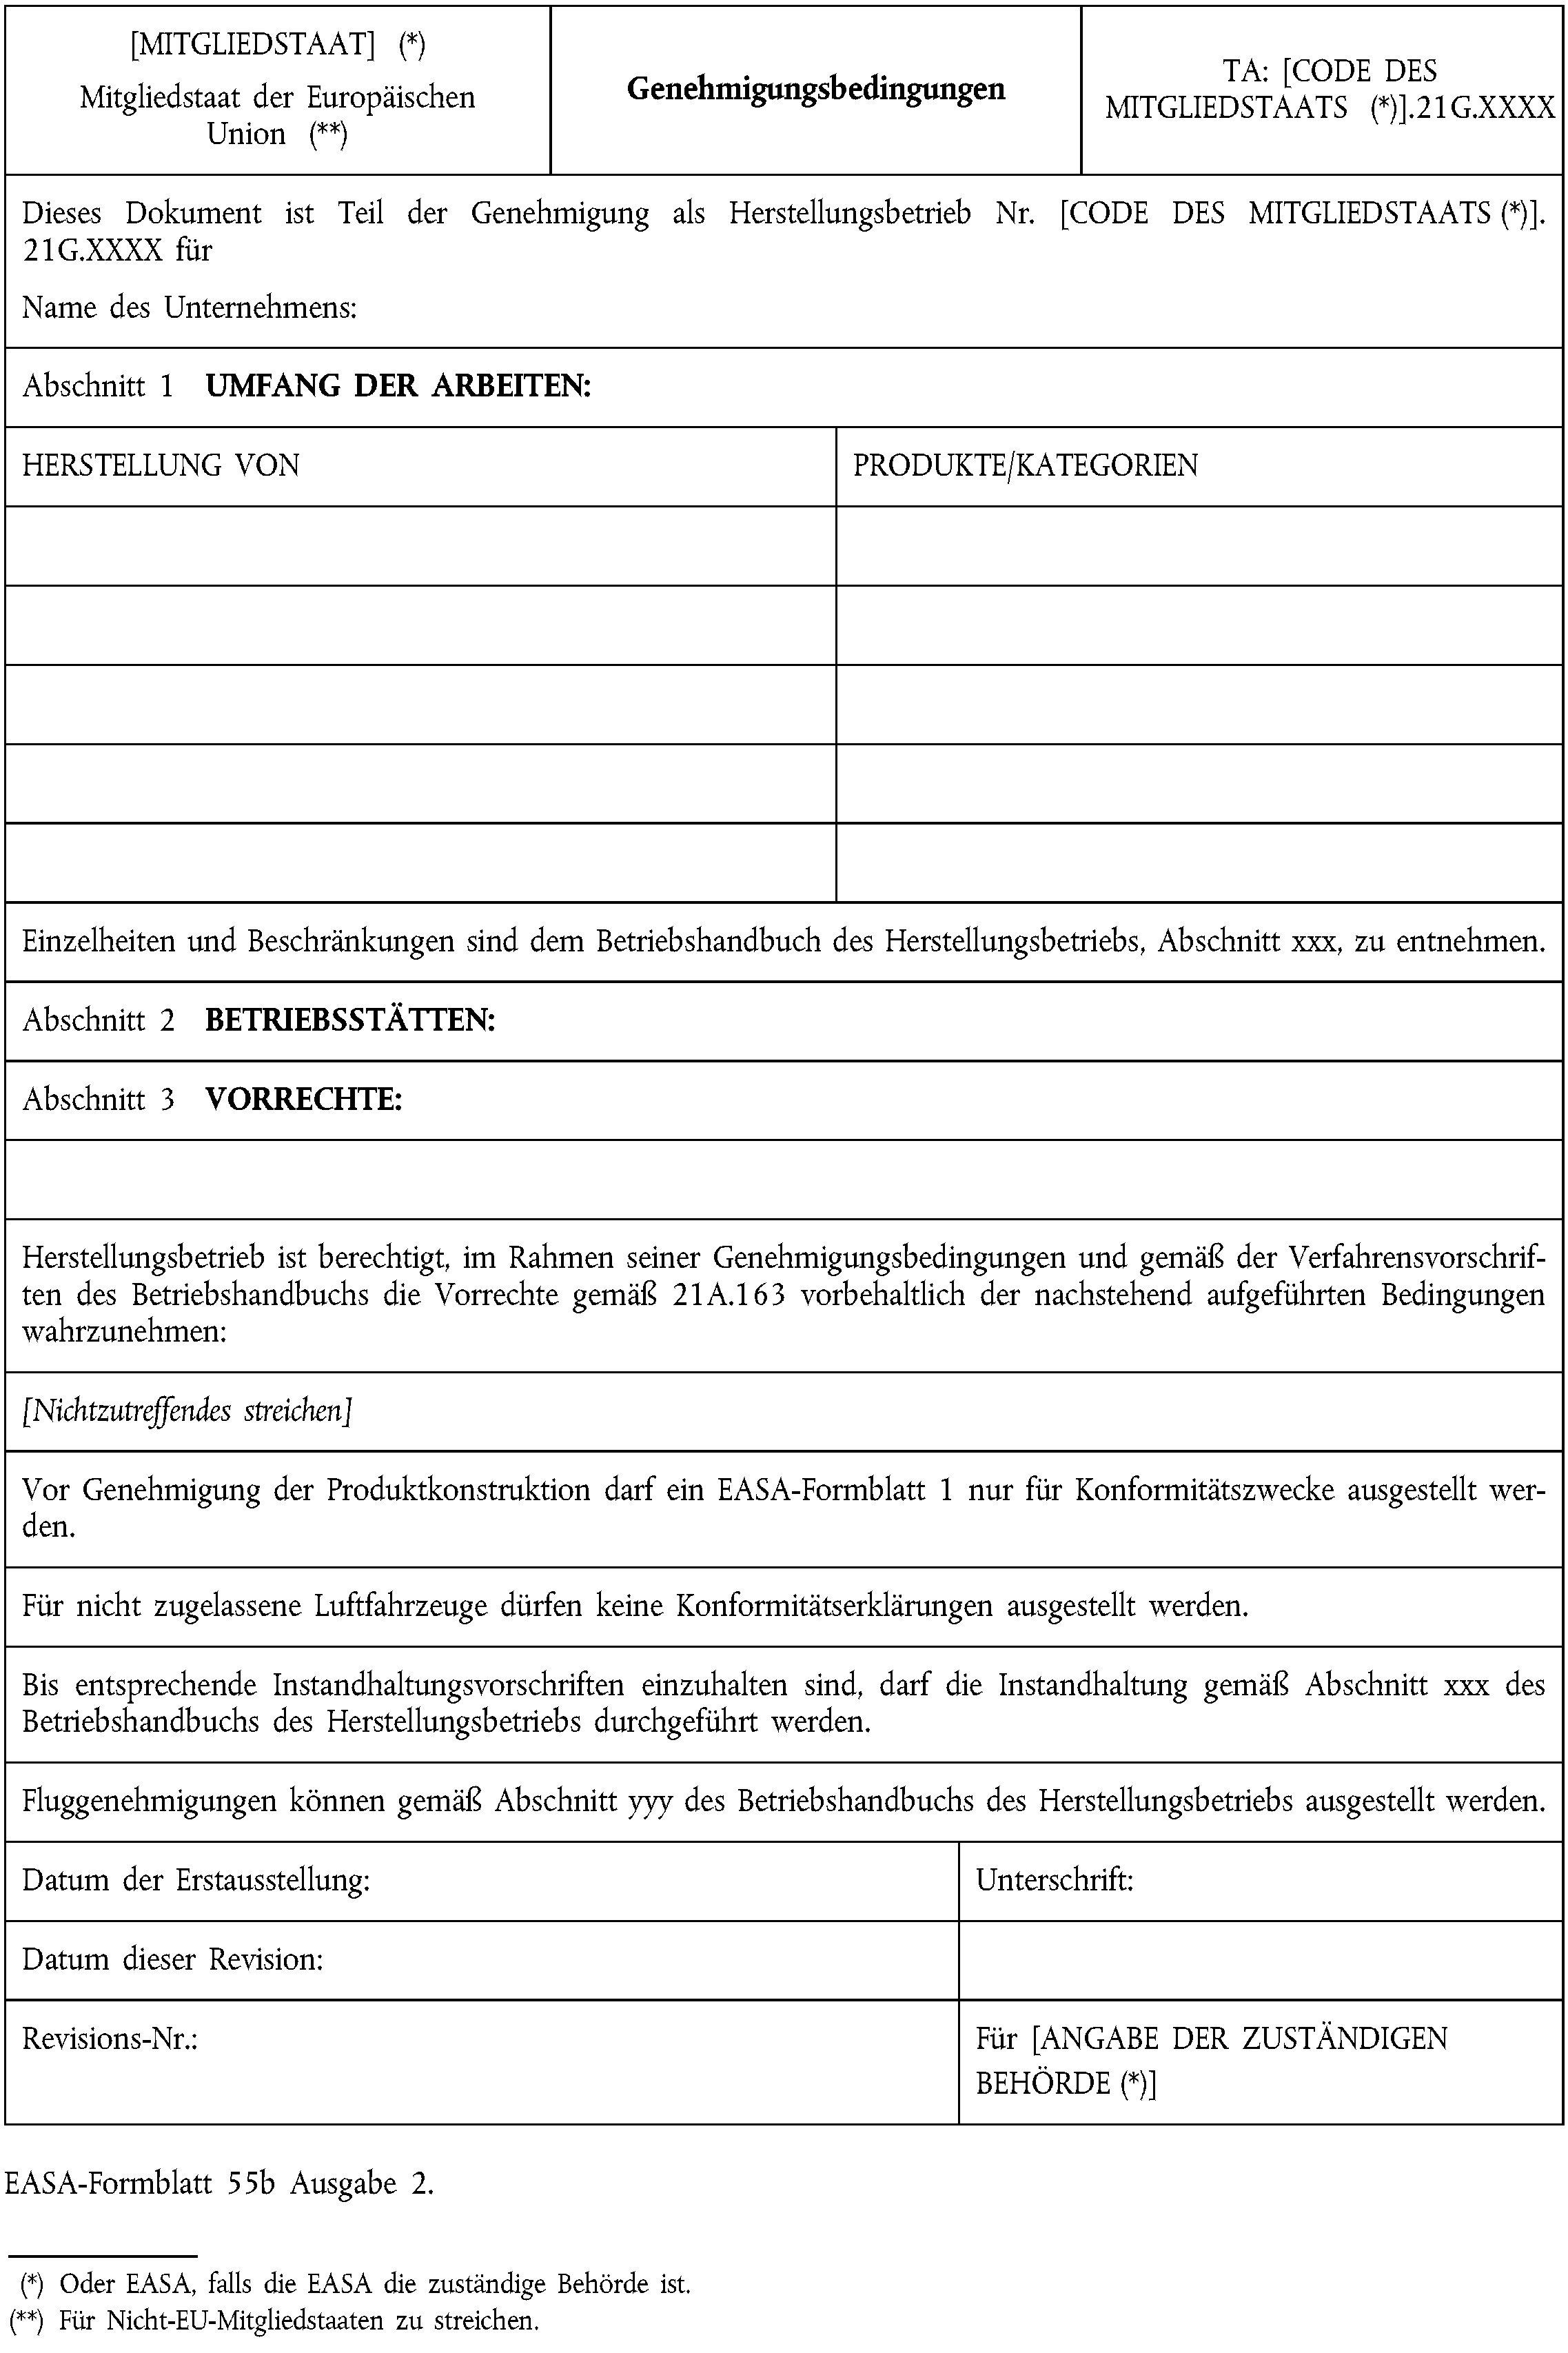 EUR-Lex - 02012R0748-20160126 - EN - EUR-Lex